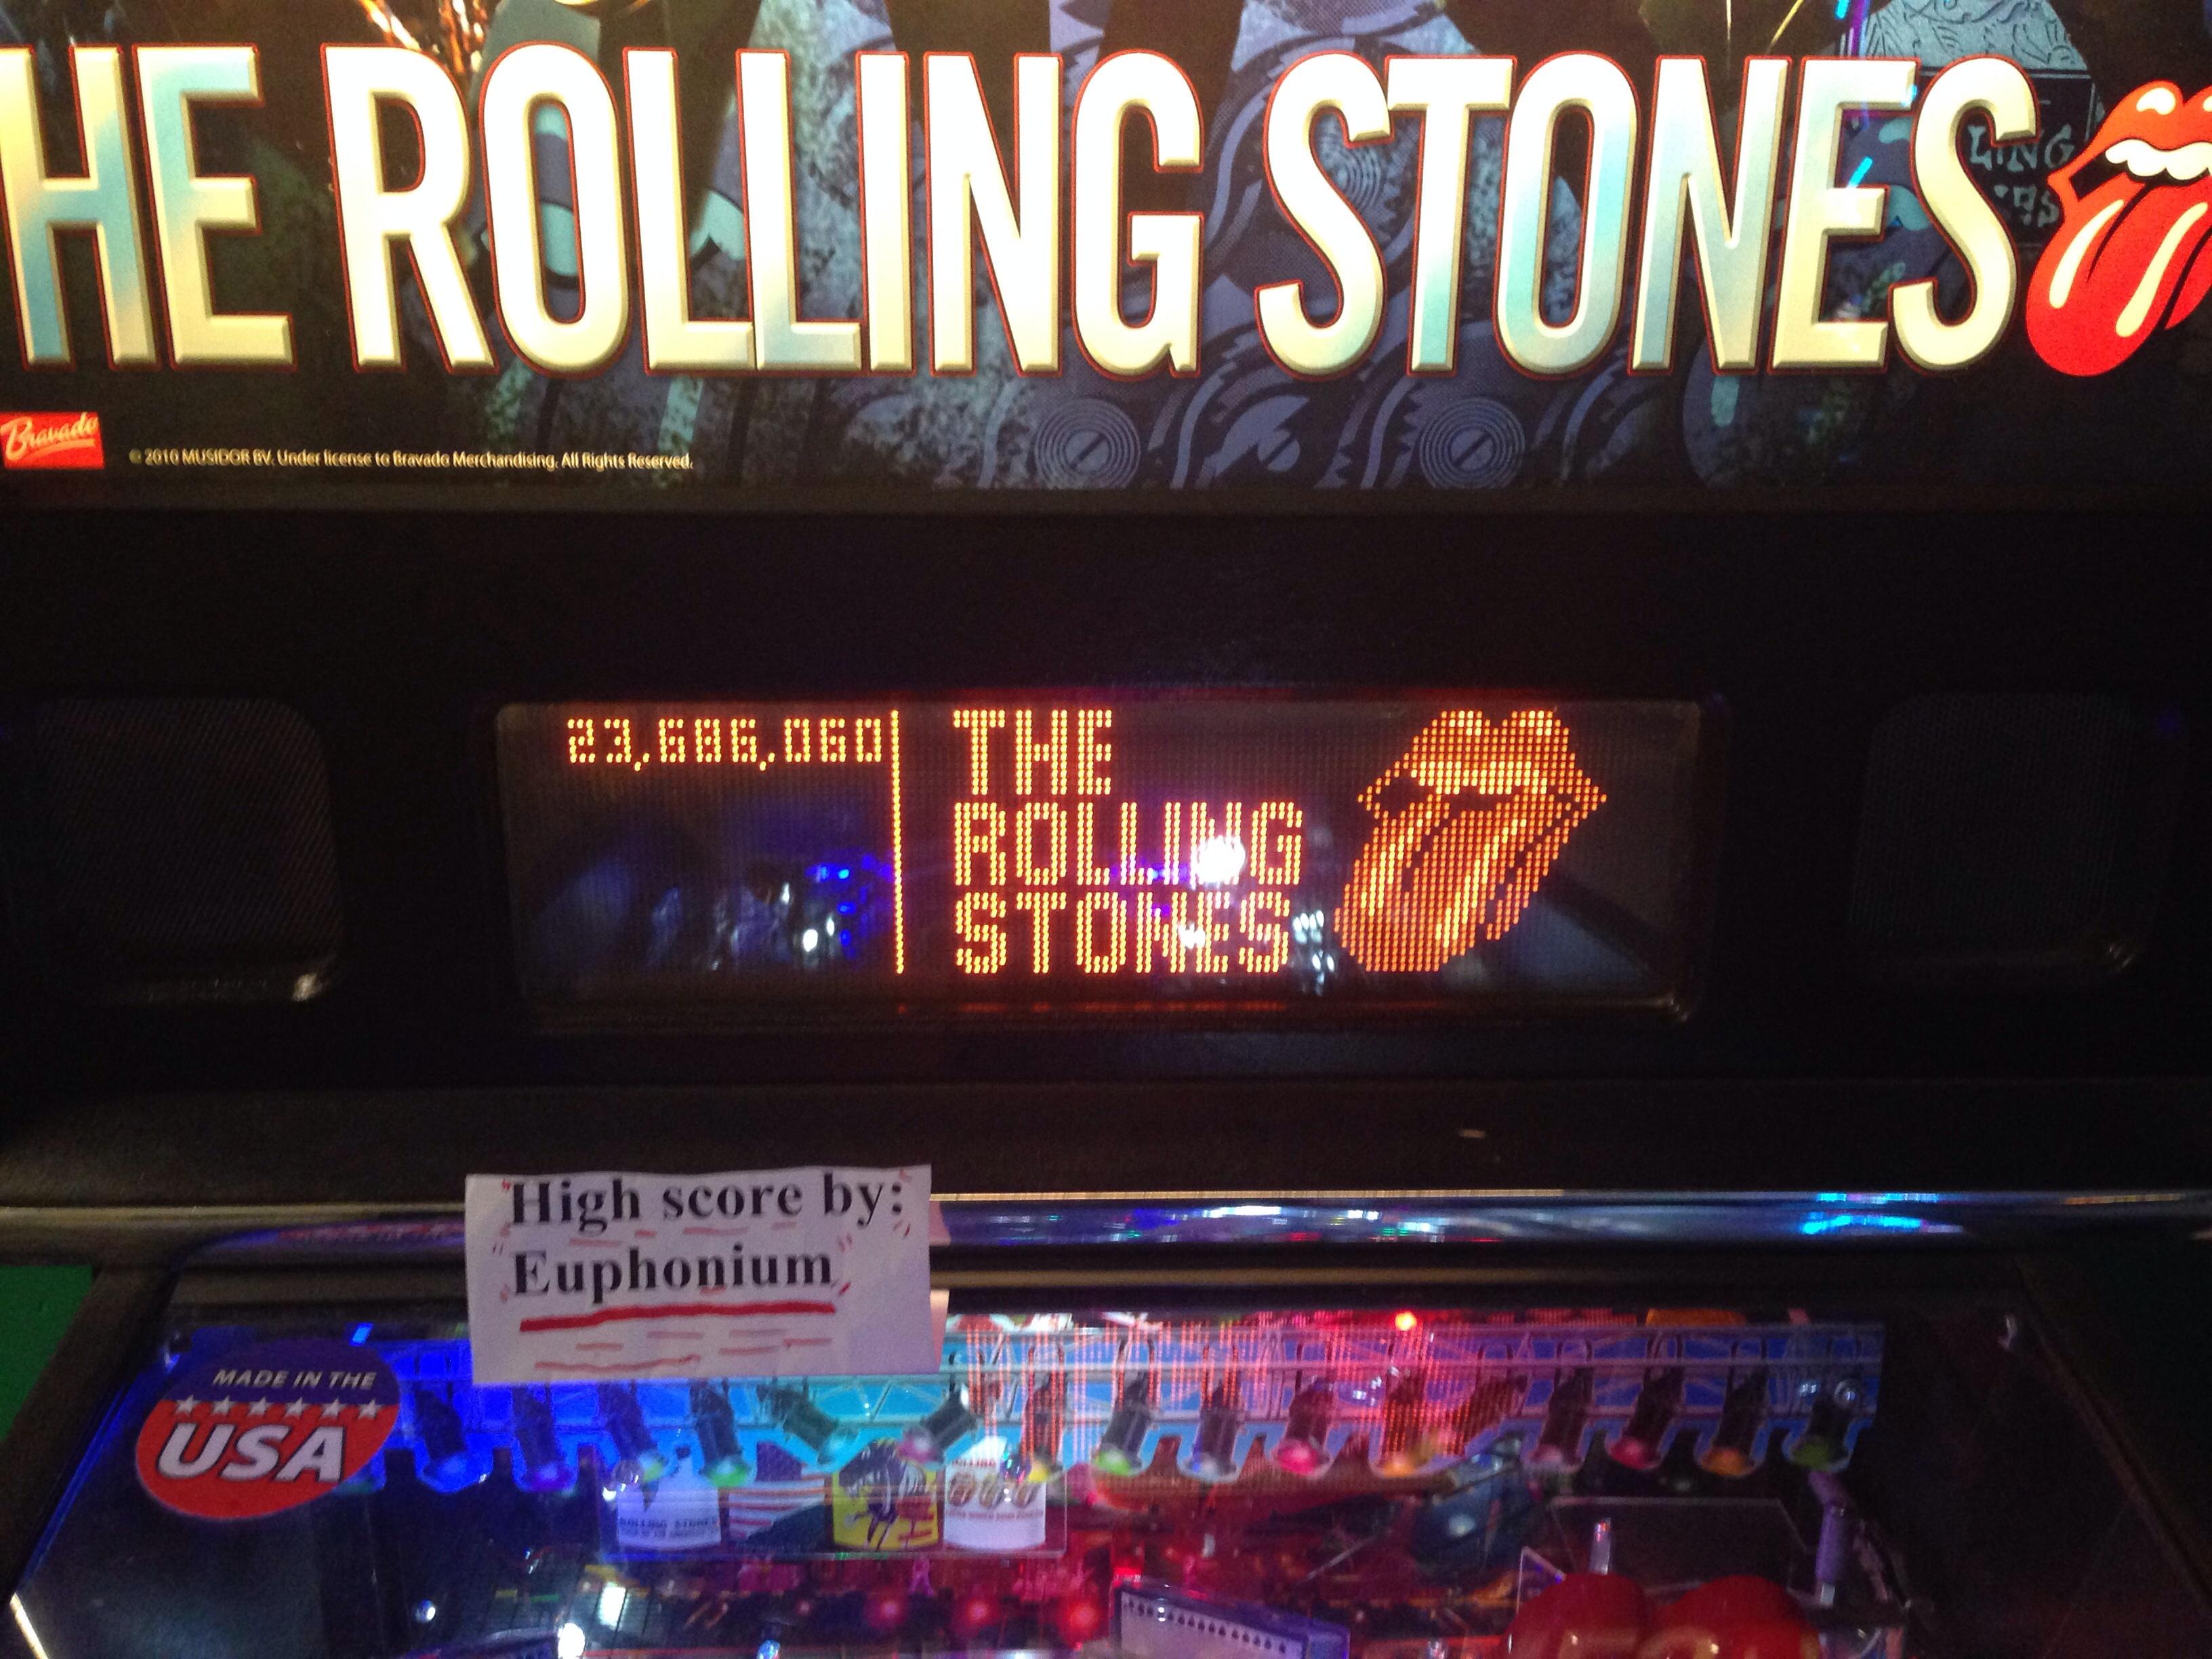 euphonium: The Rolling Stones [Stern Pinball] (Pinball: 3 Balls) 23,686,060 points on 2016-05-24 07:00:25